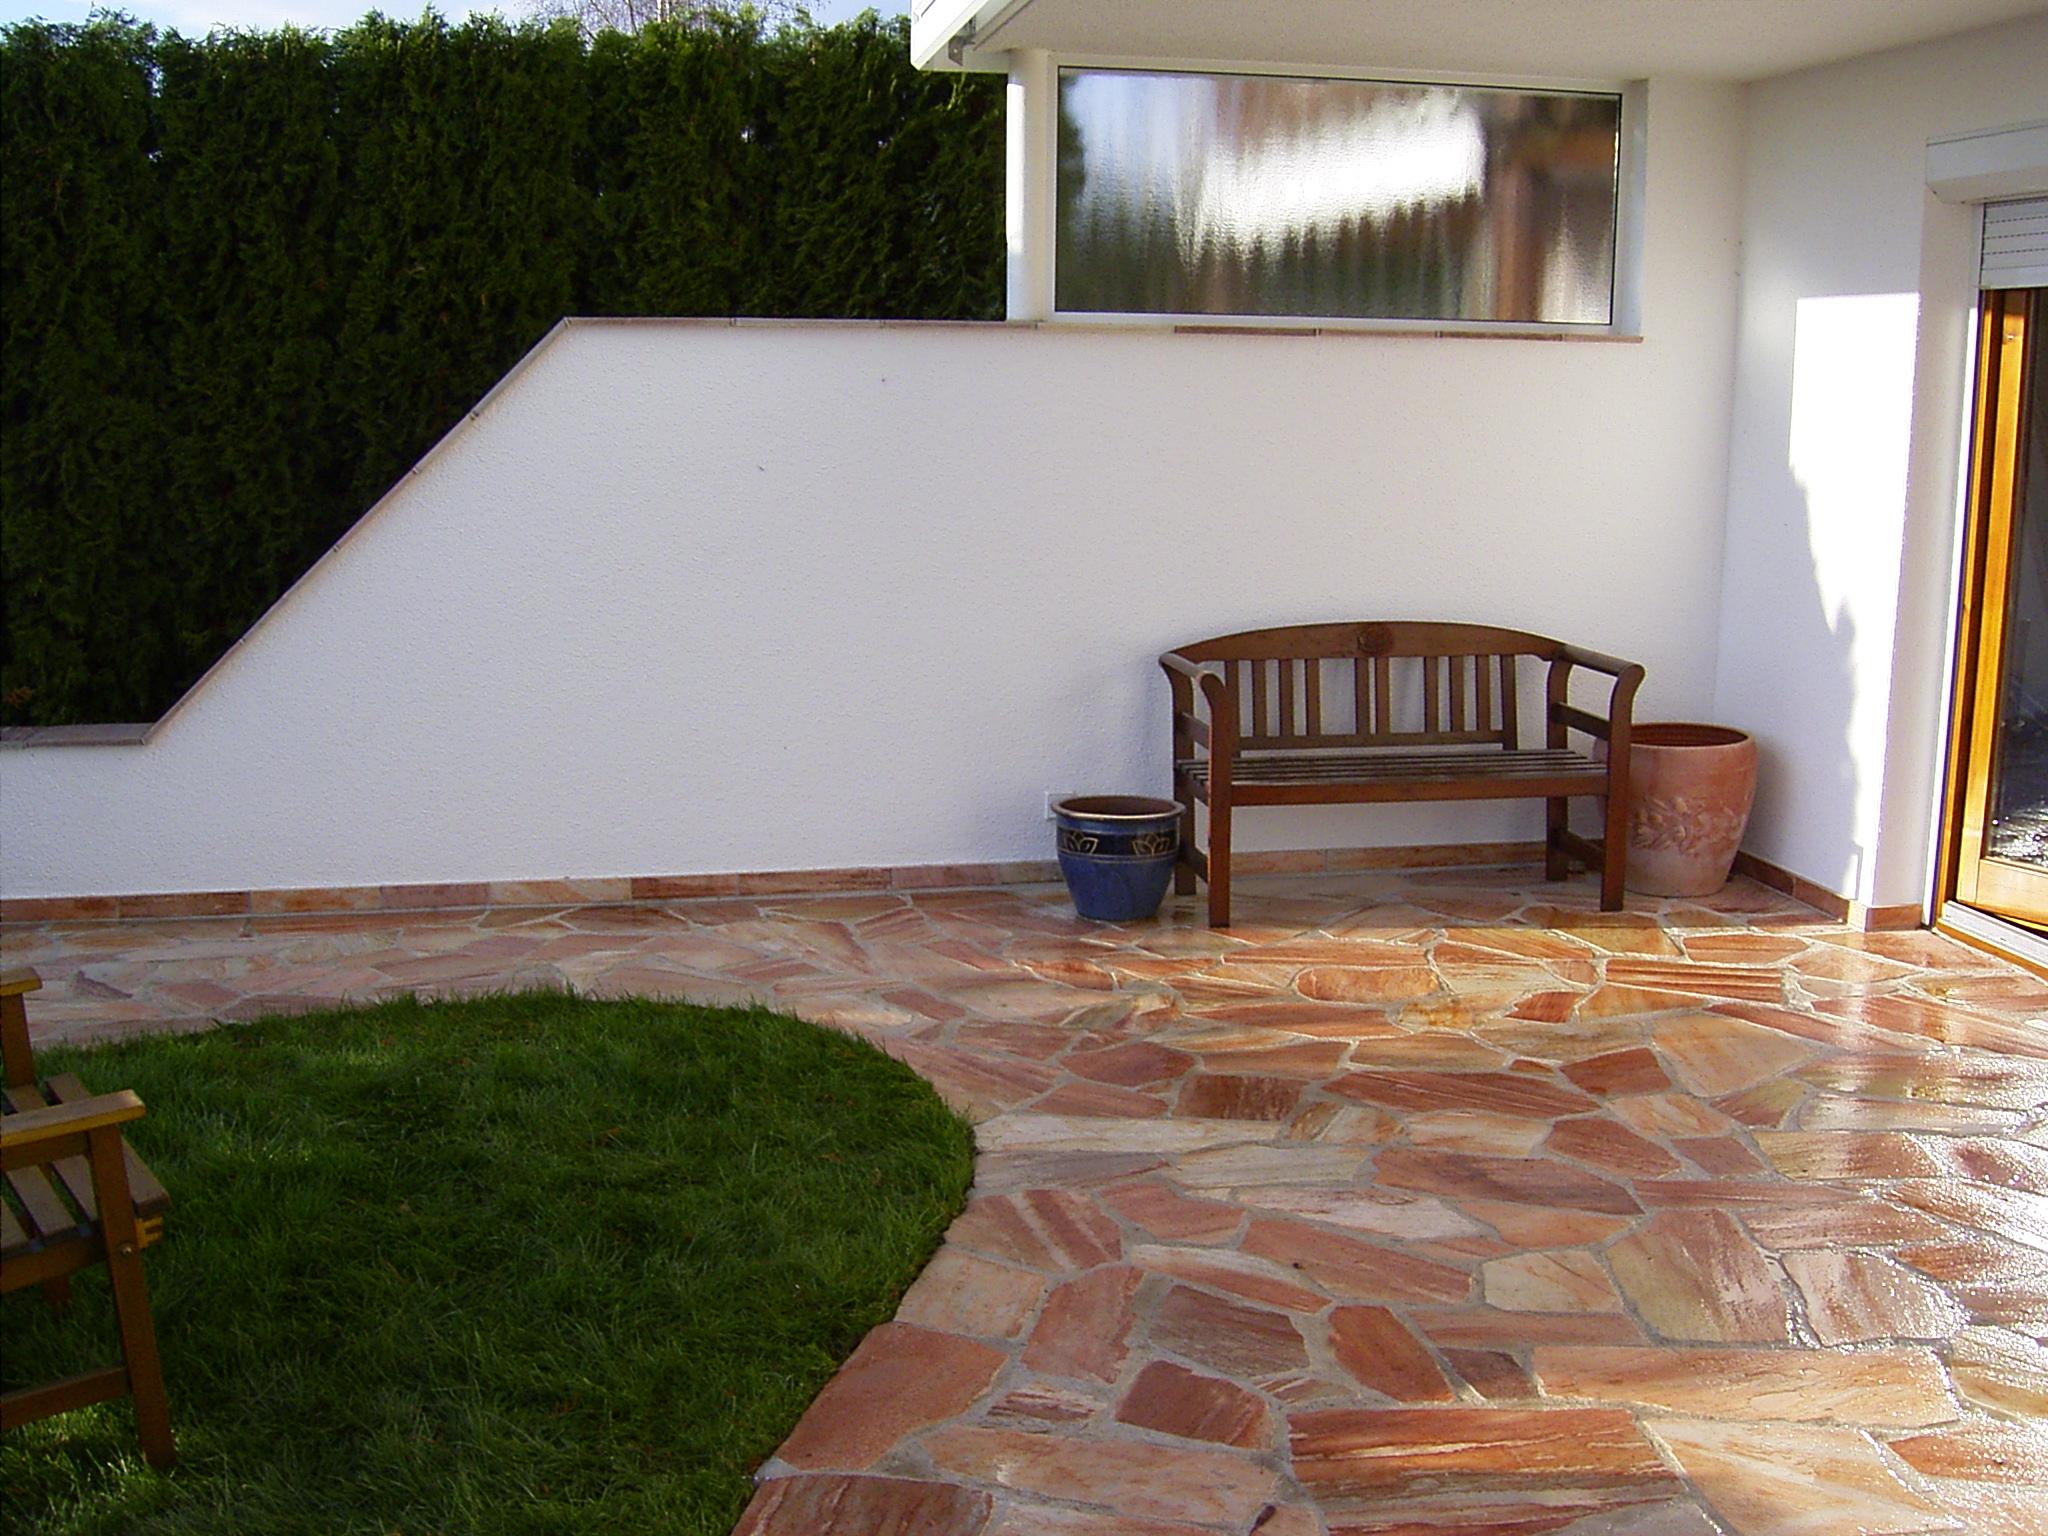 Terrasse aus Quarzit-Polygonalplatten